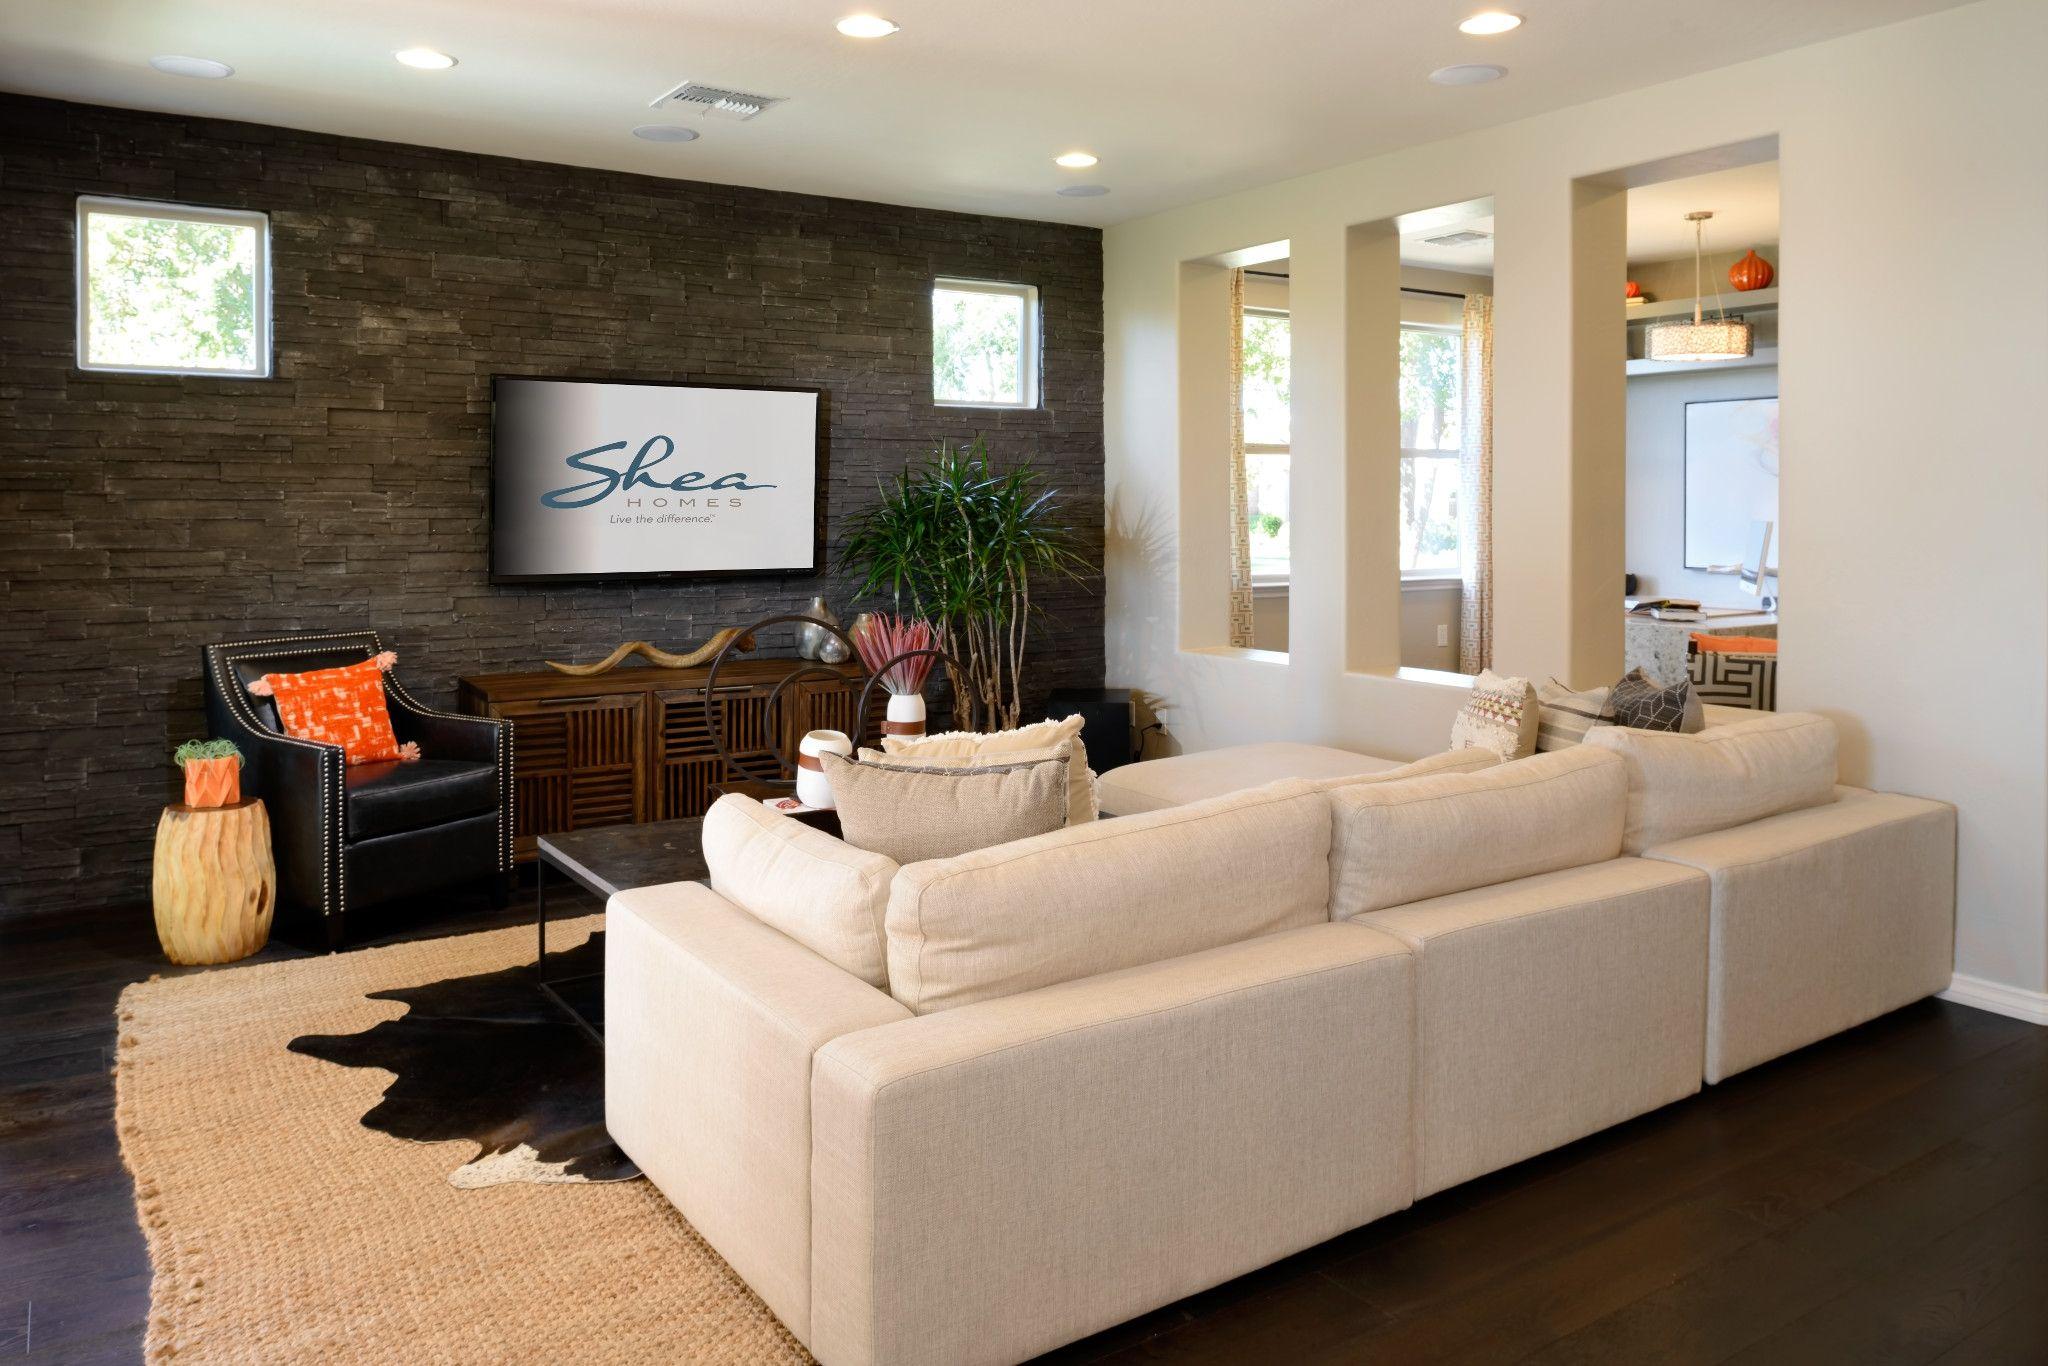 http://partners-dynamic.bdxcdn.com/Images/Homes/Shea/max1500_32871846-190313.jpg